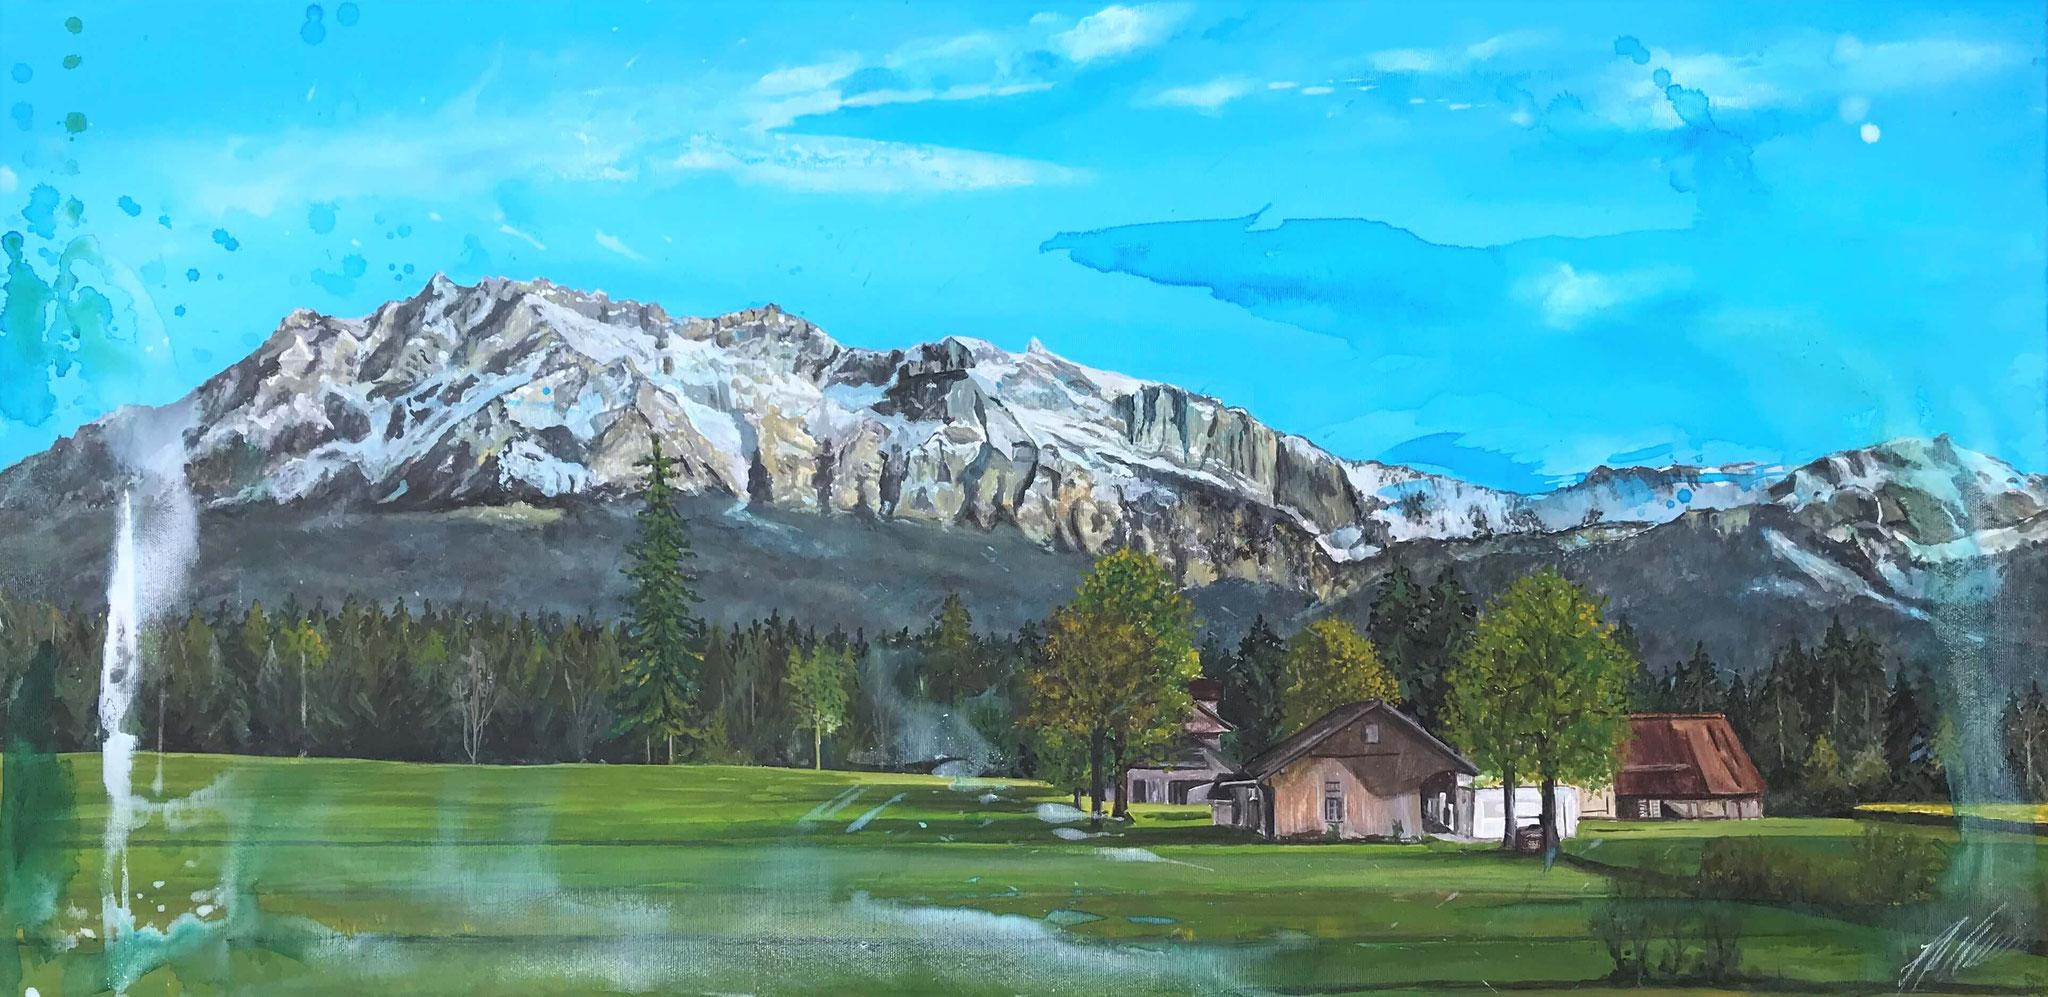 "Fr. 750.00 ""Rainer Landschaft"" Acryl auf Leinwand 140 x 70 cm."